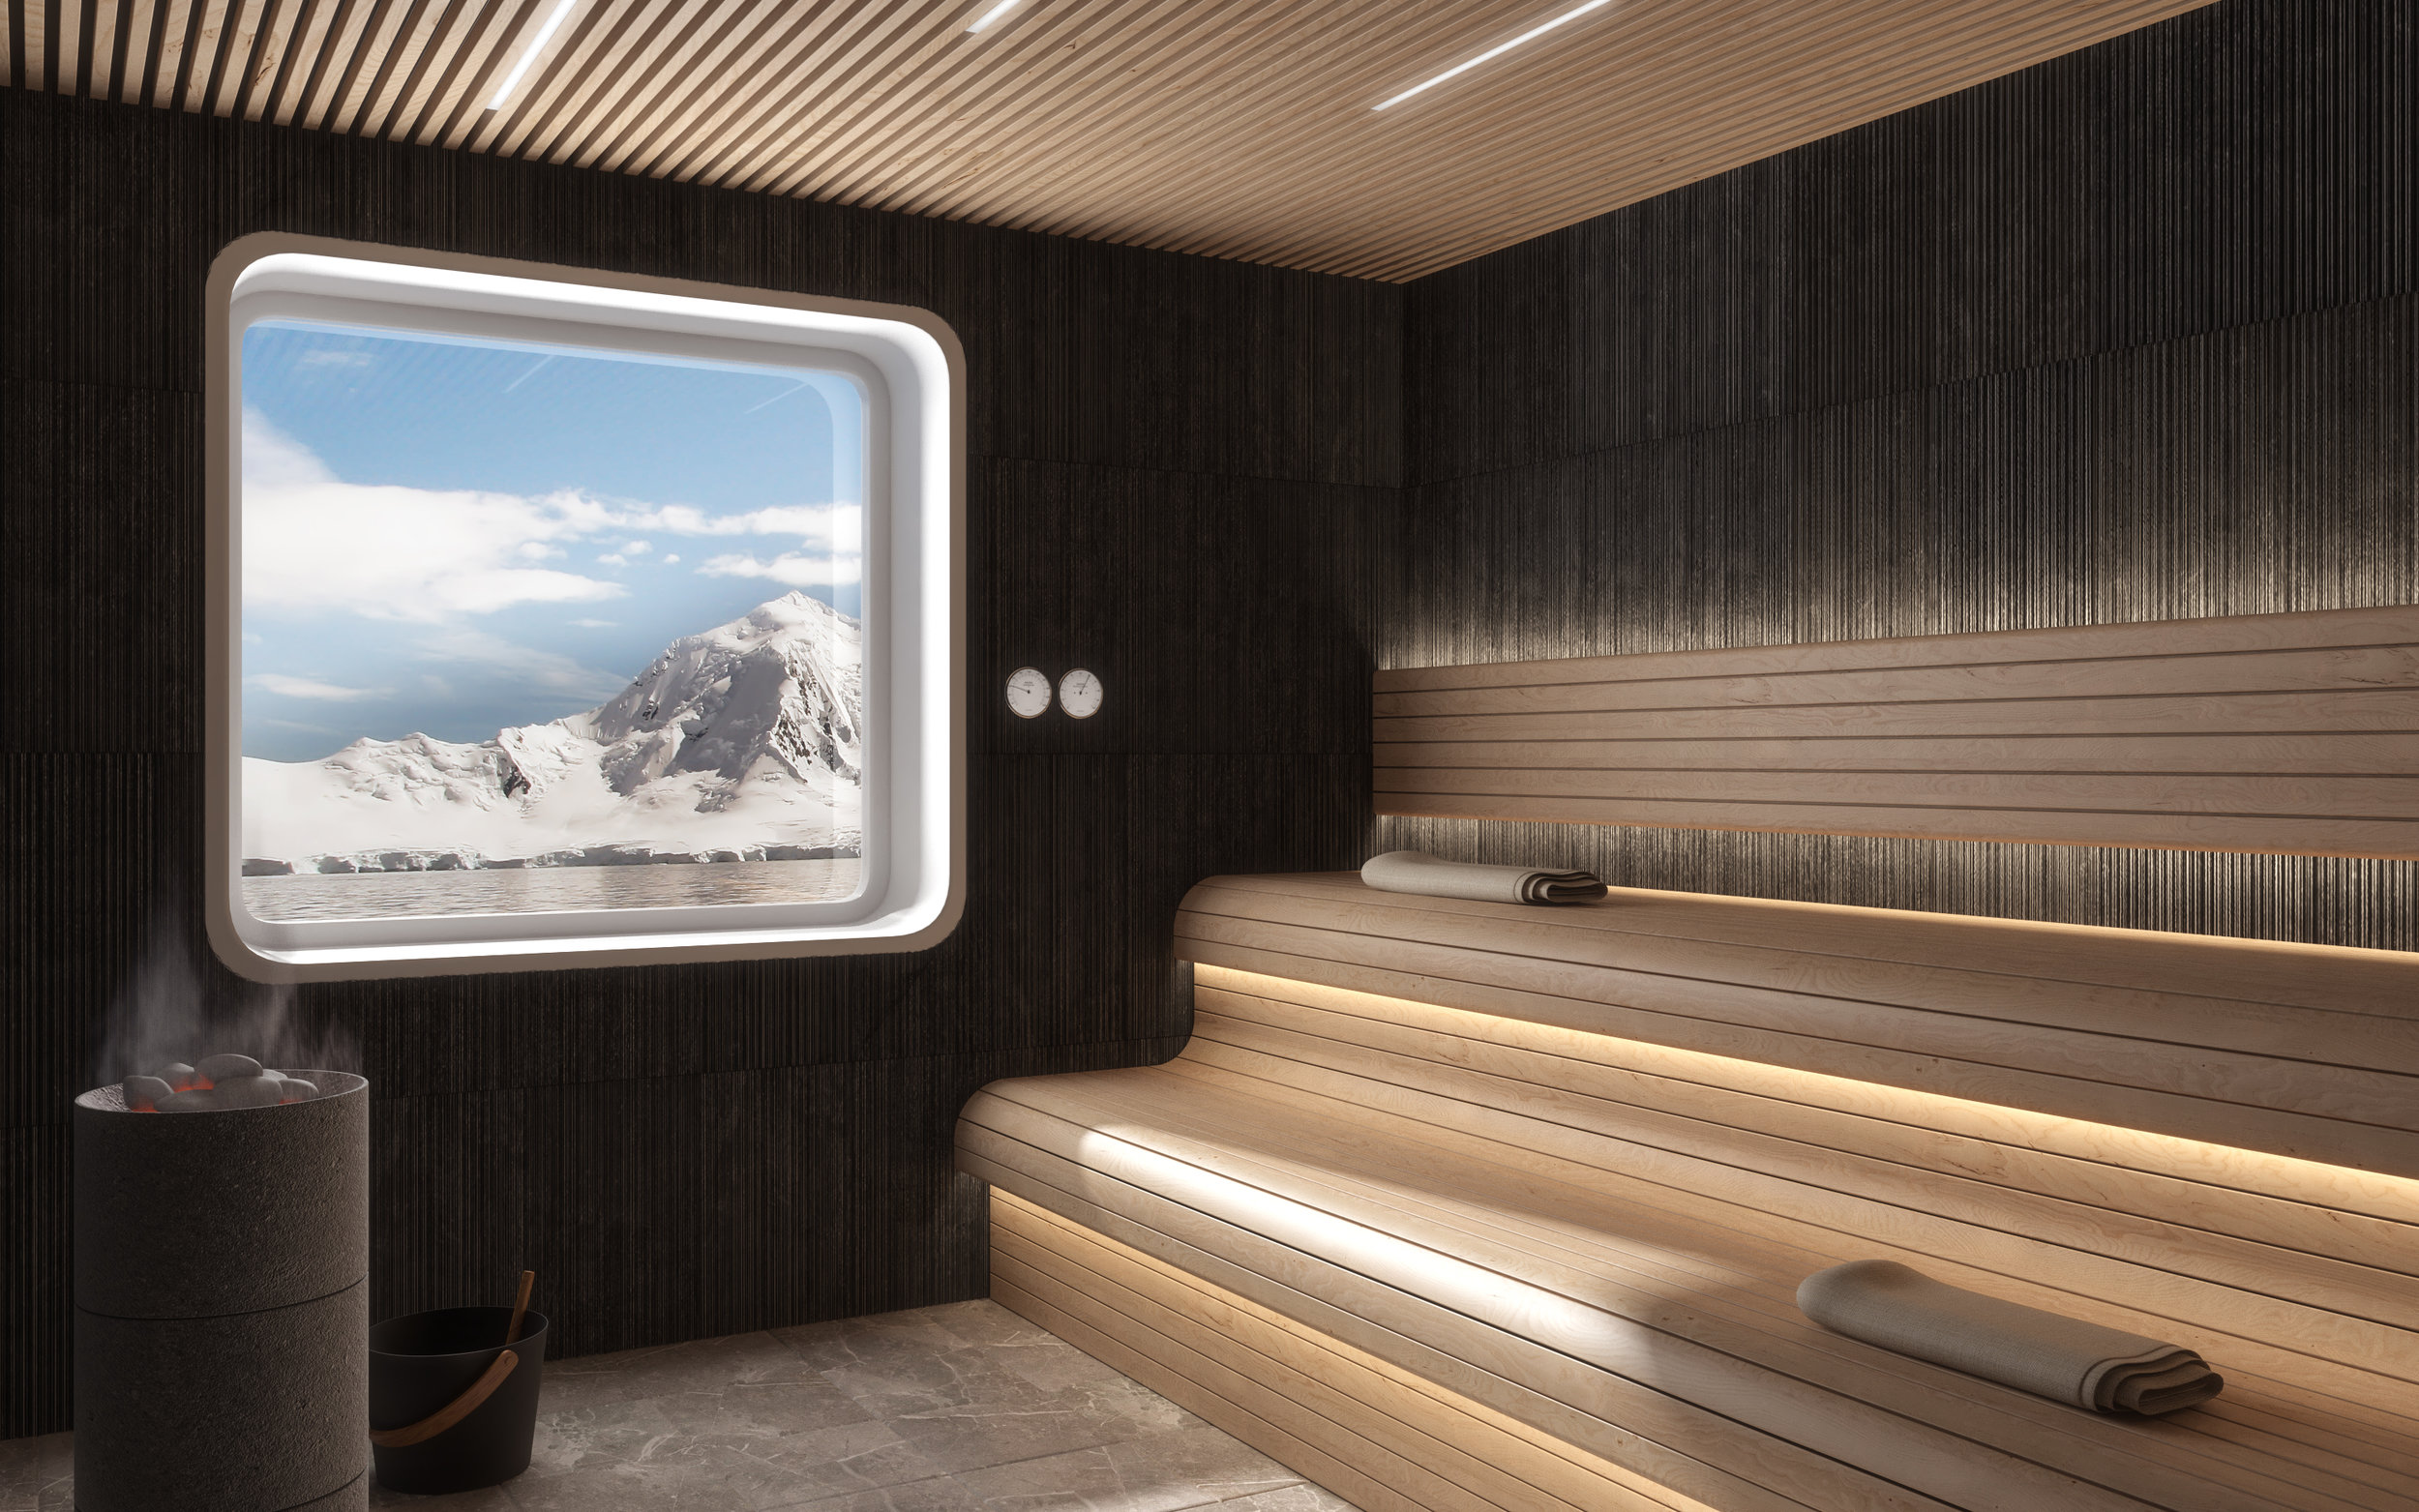 Crystal-Endeavor_Spa-Sauna.jpg